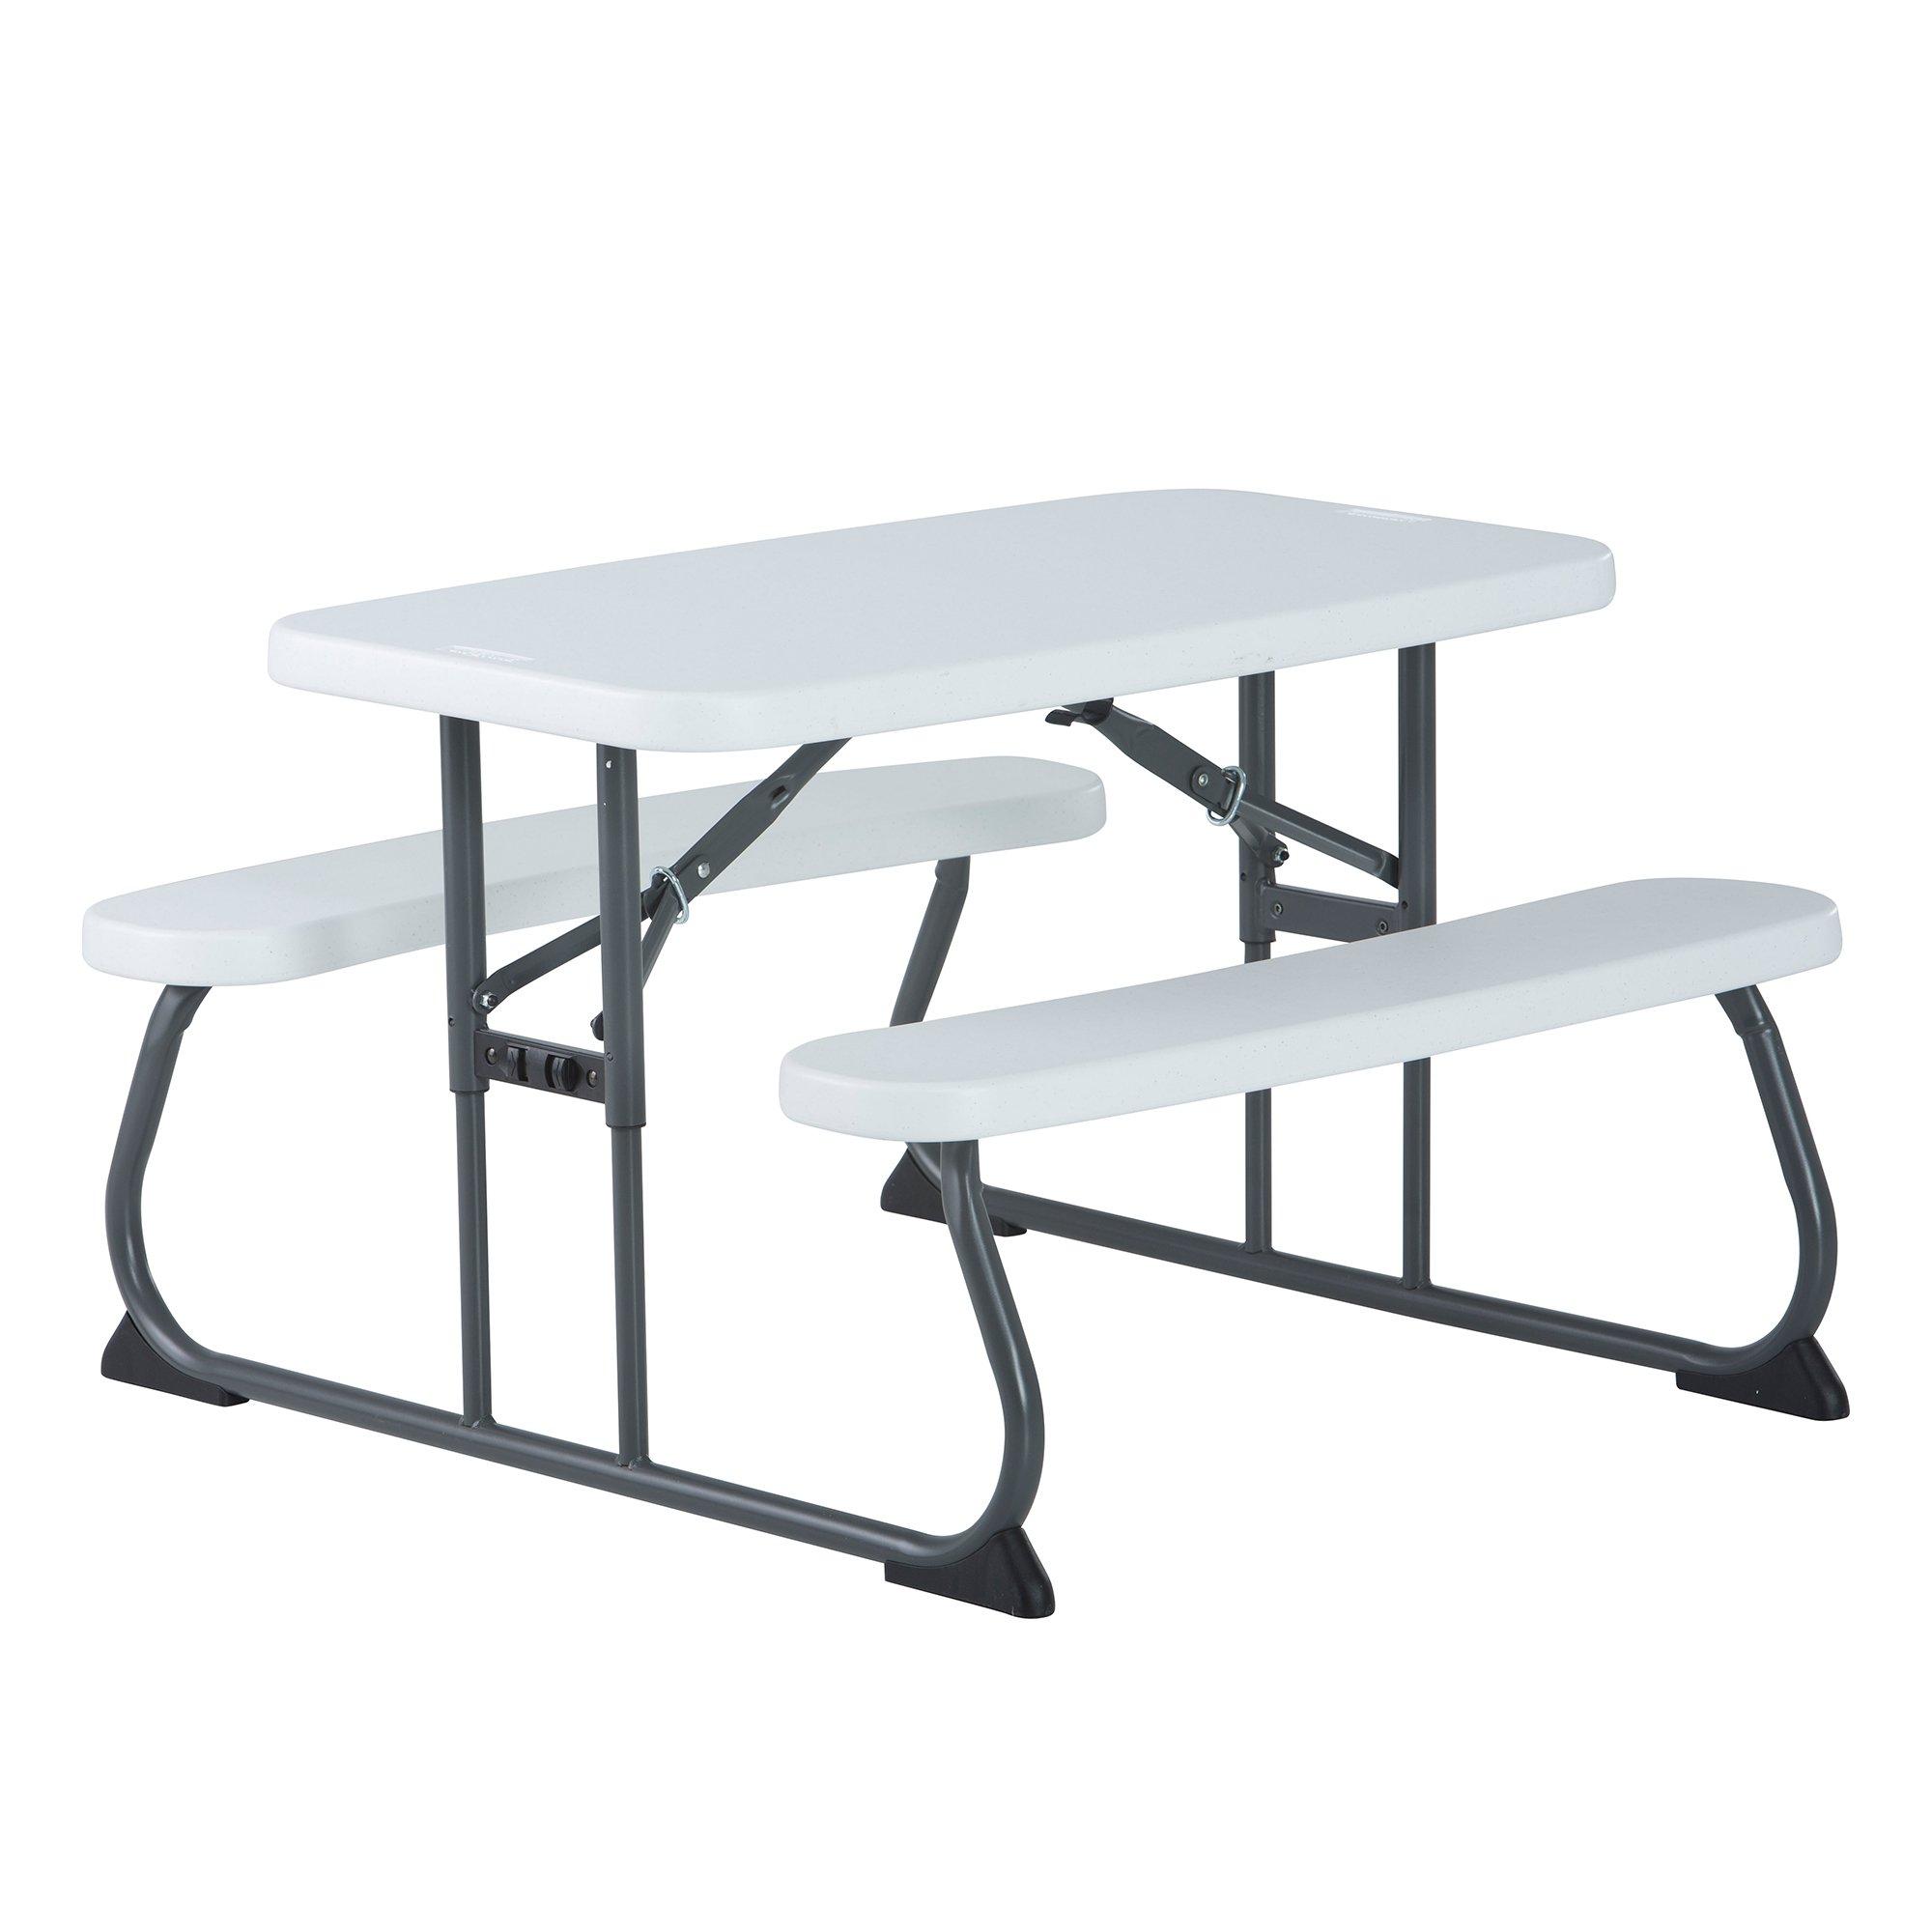 Lifetime 60239 Kid's Picnic Table, White